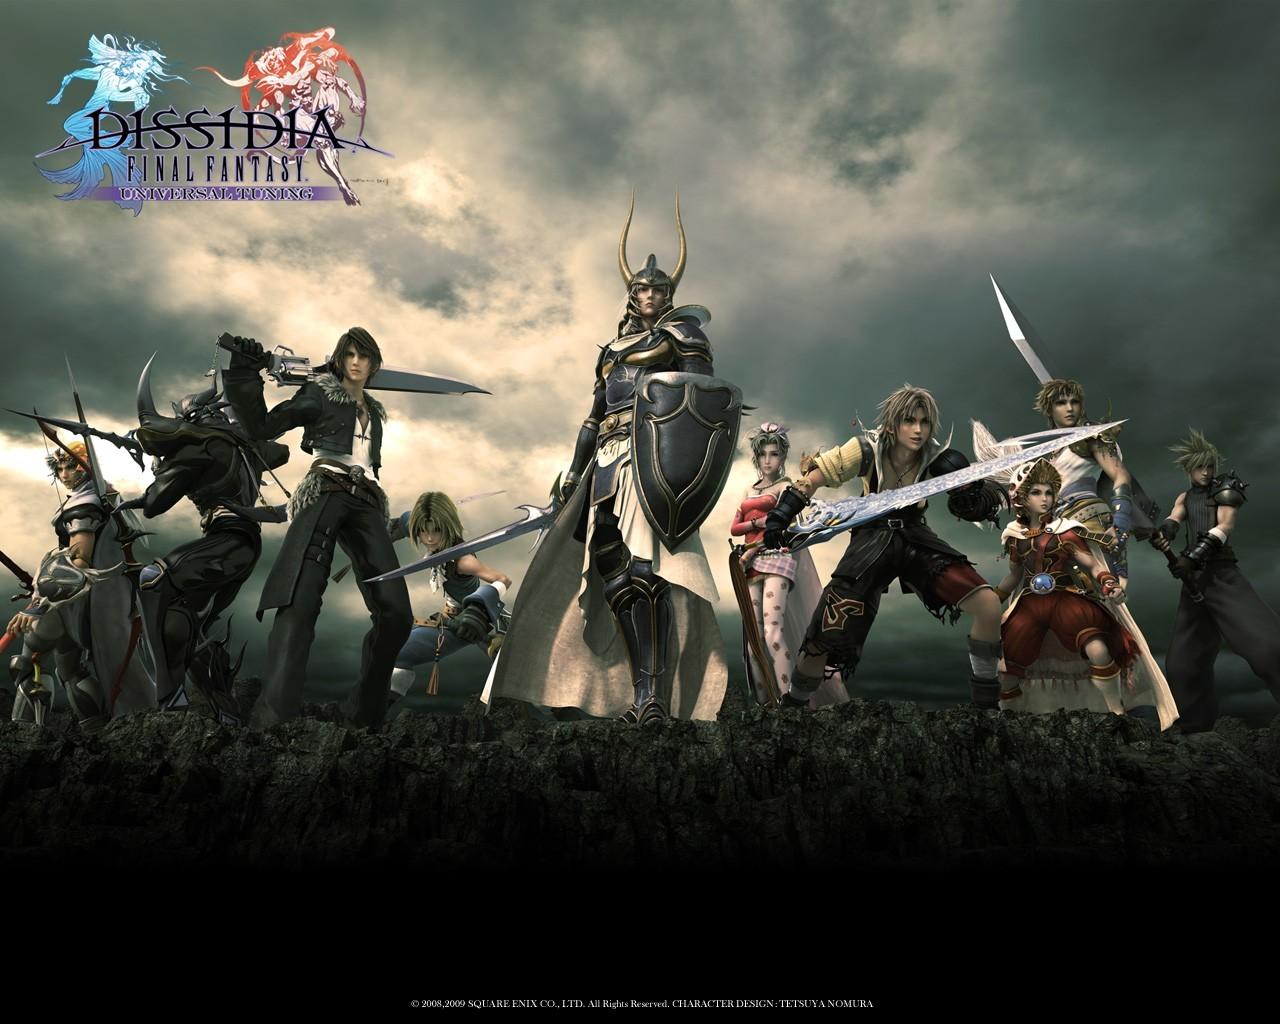 Final Fantasy x Artwork Artworks Dissidia Final